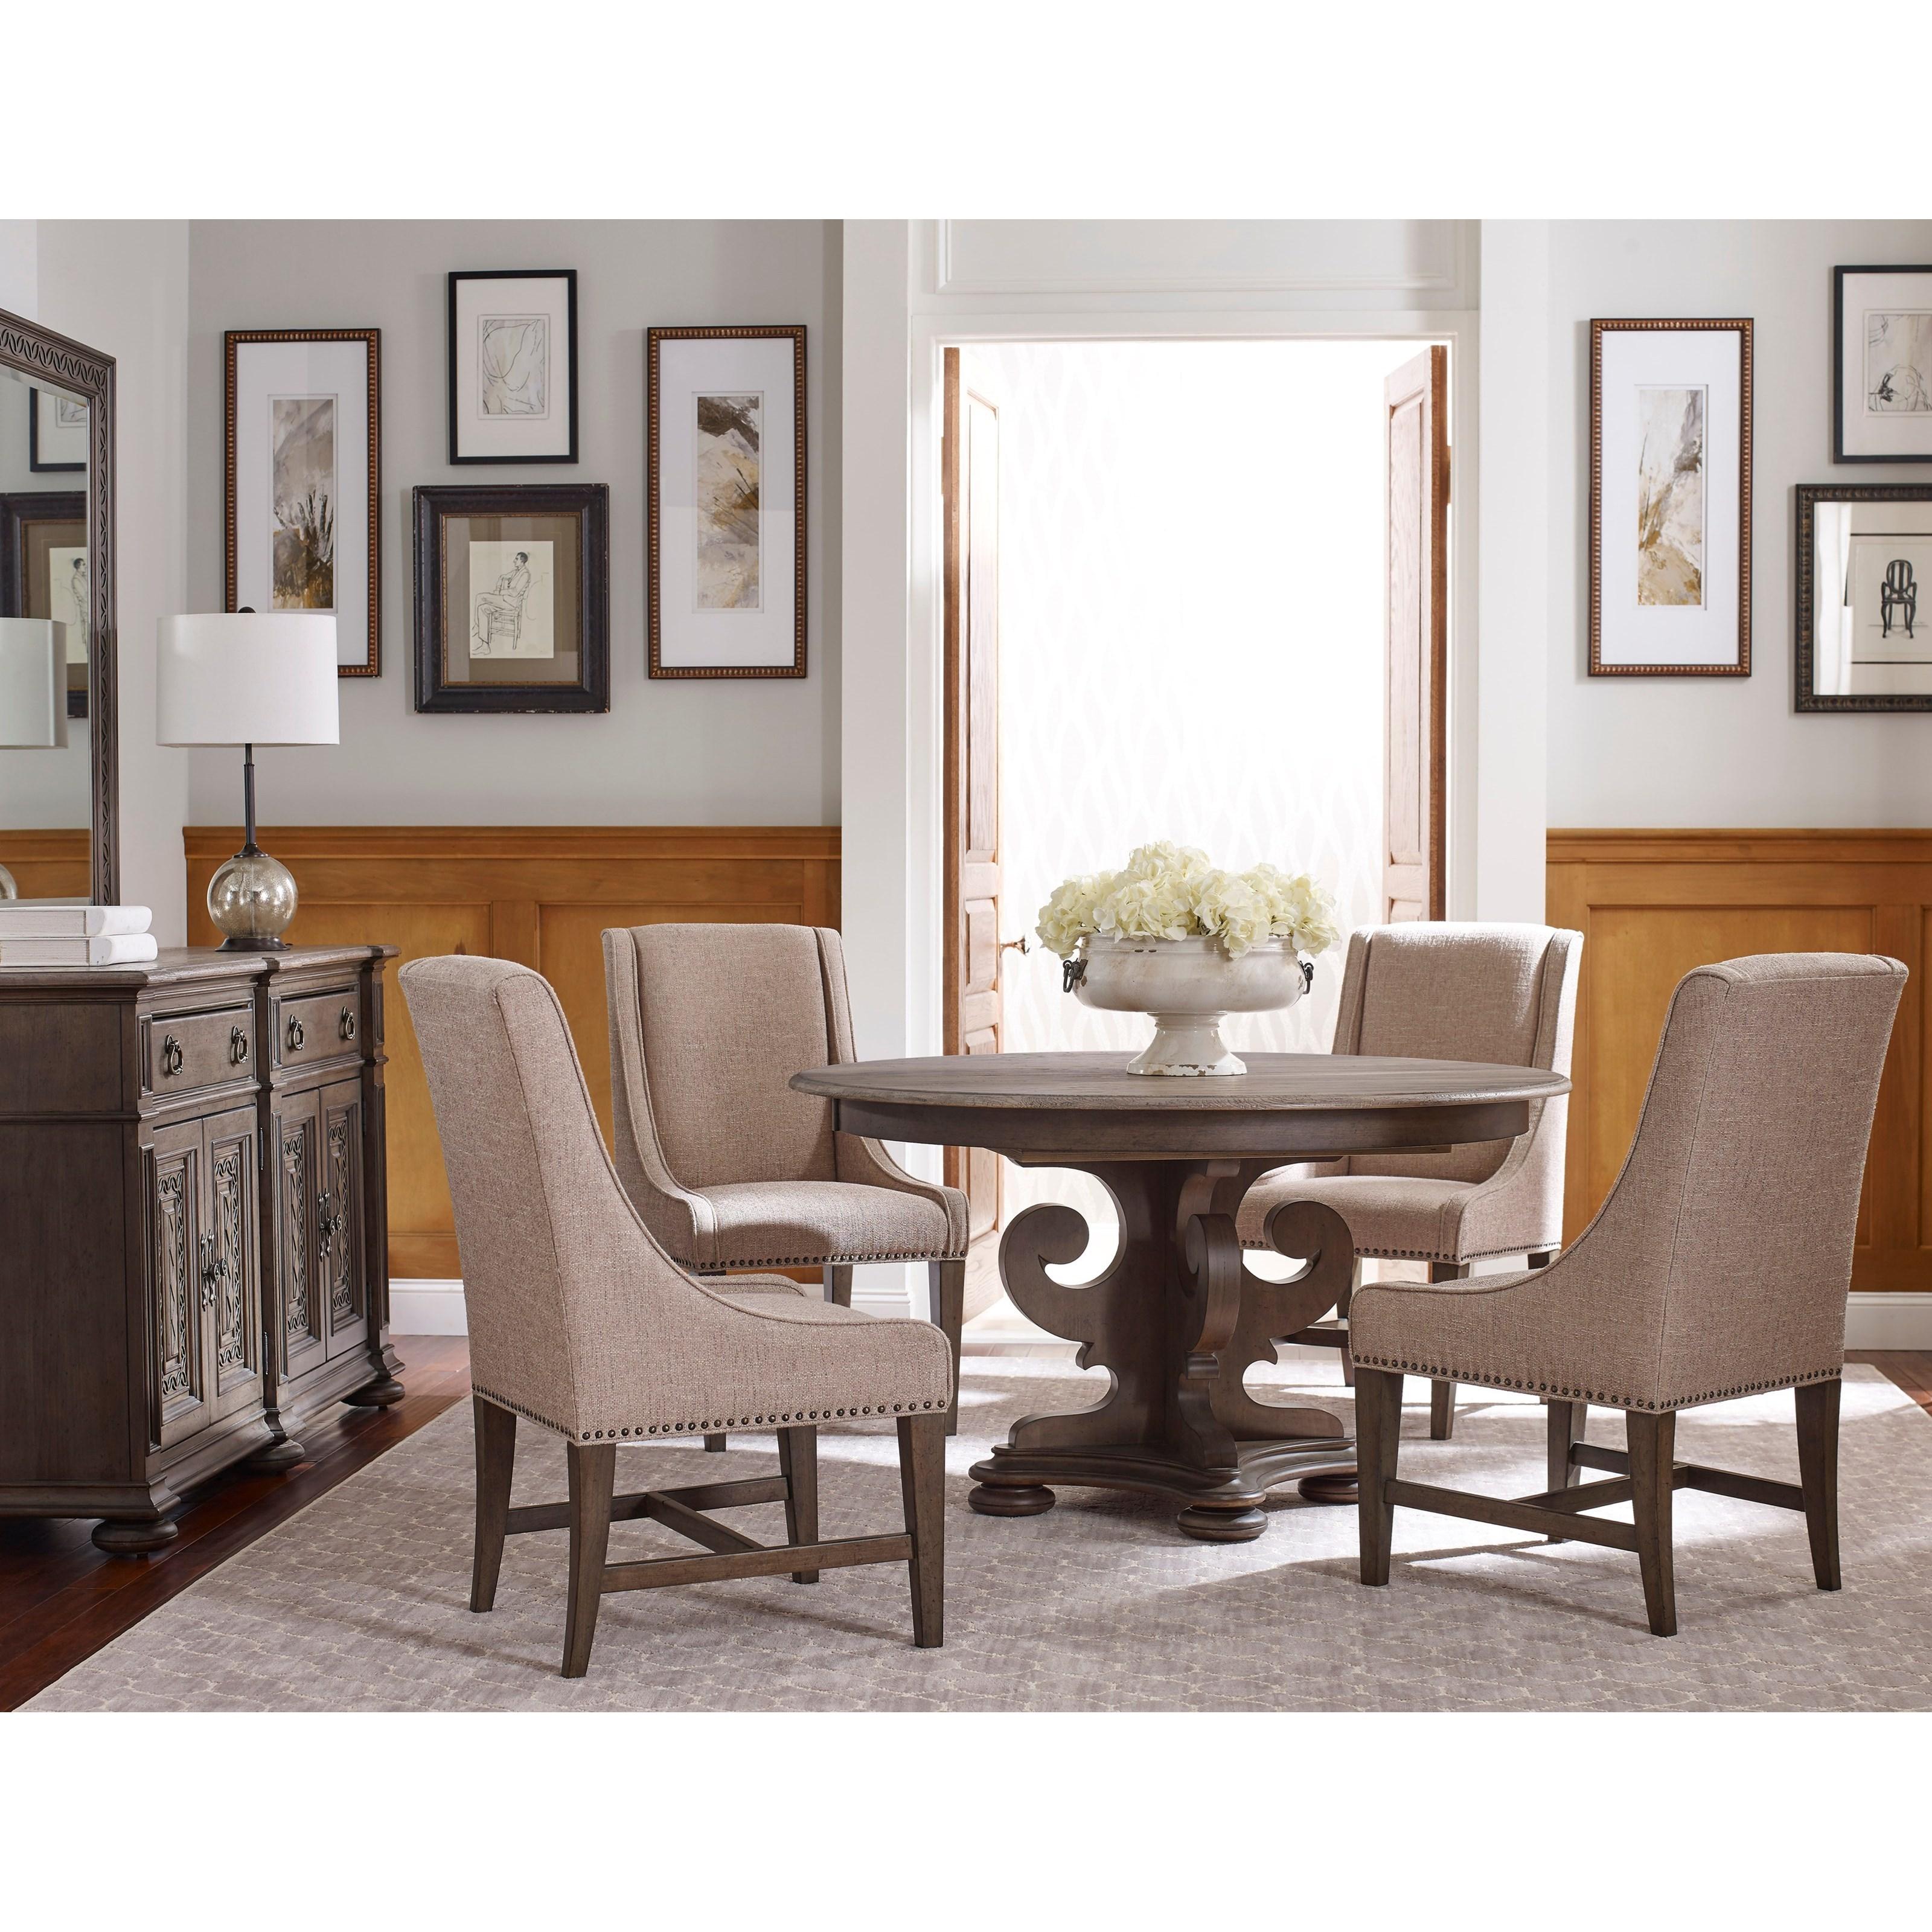 Stanley dining room furniture